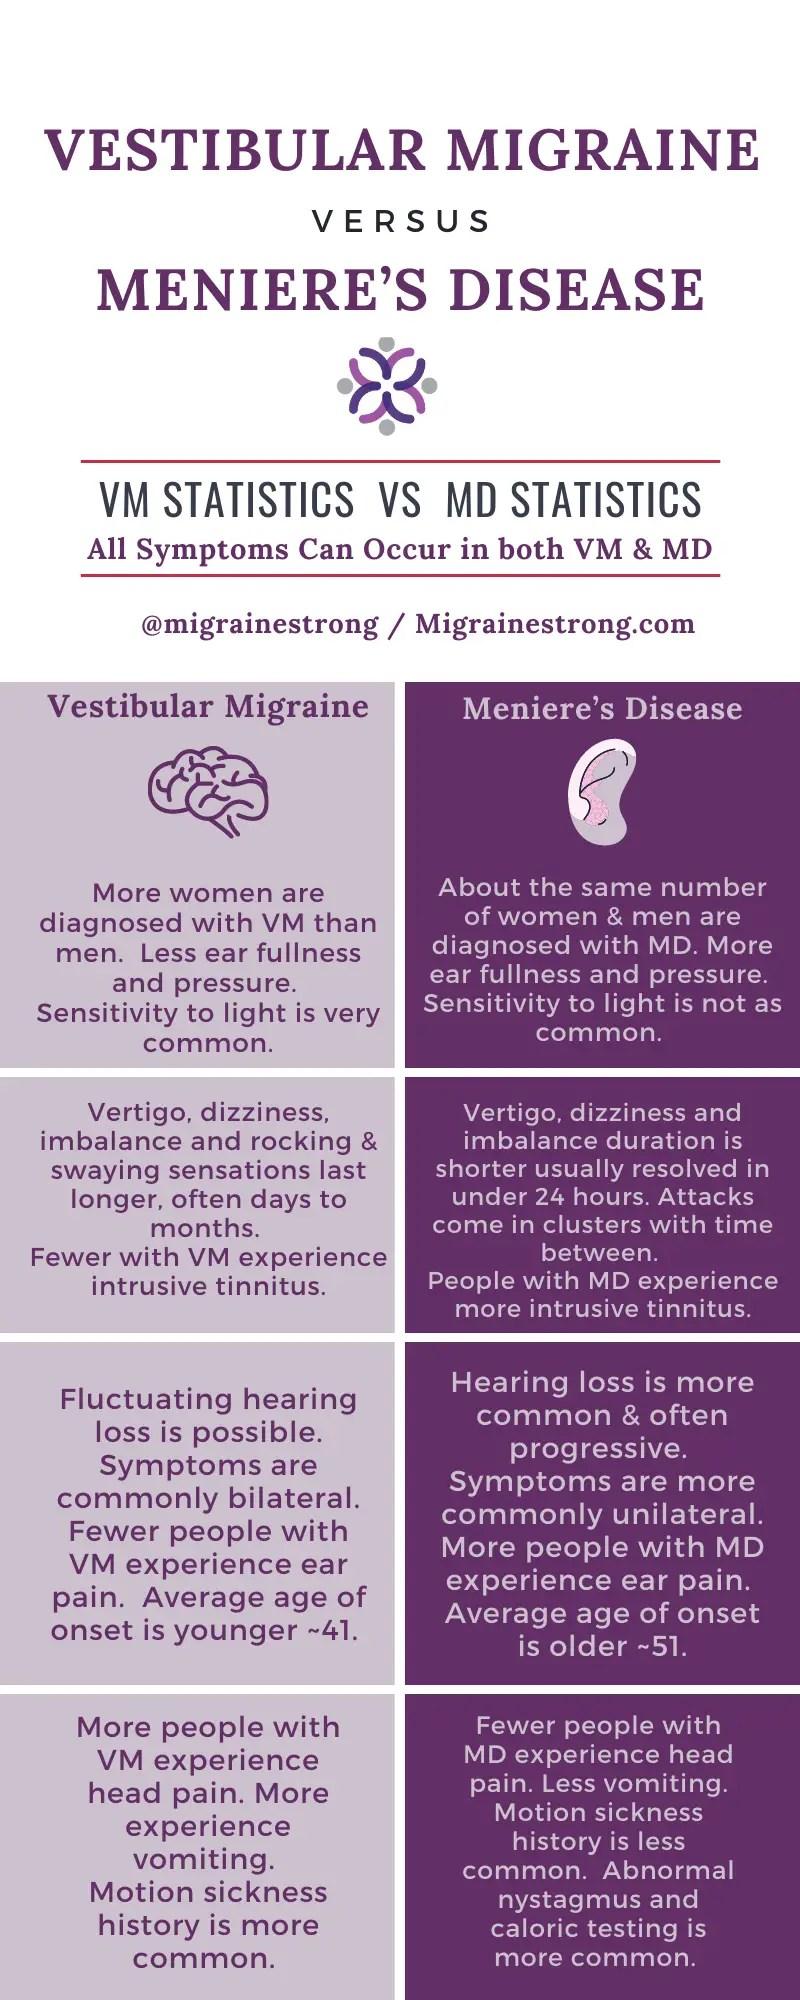 The Vestibular Migraine And Meniere S Disease Connection Explained Migraine Strong